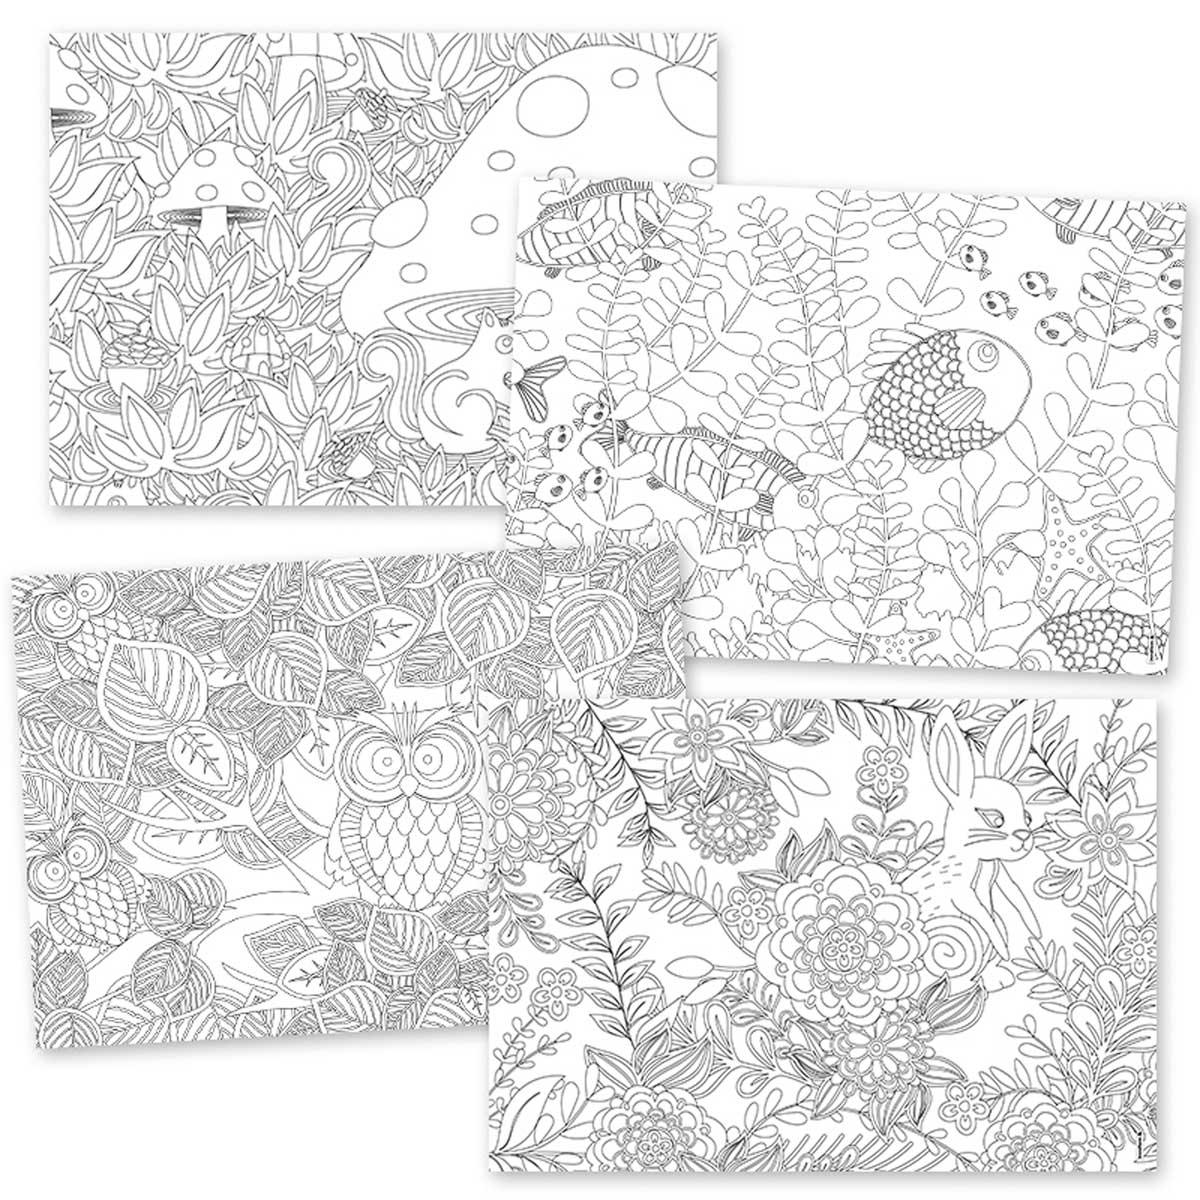 papiertischset coloring fun color me kaufen corpus. Black Bedroom Furniture Sets. Home Design Ideas